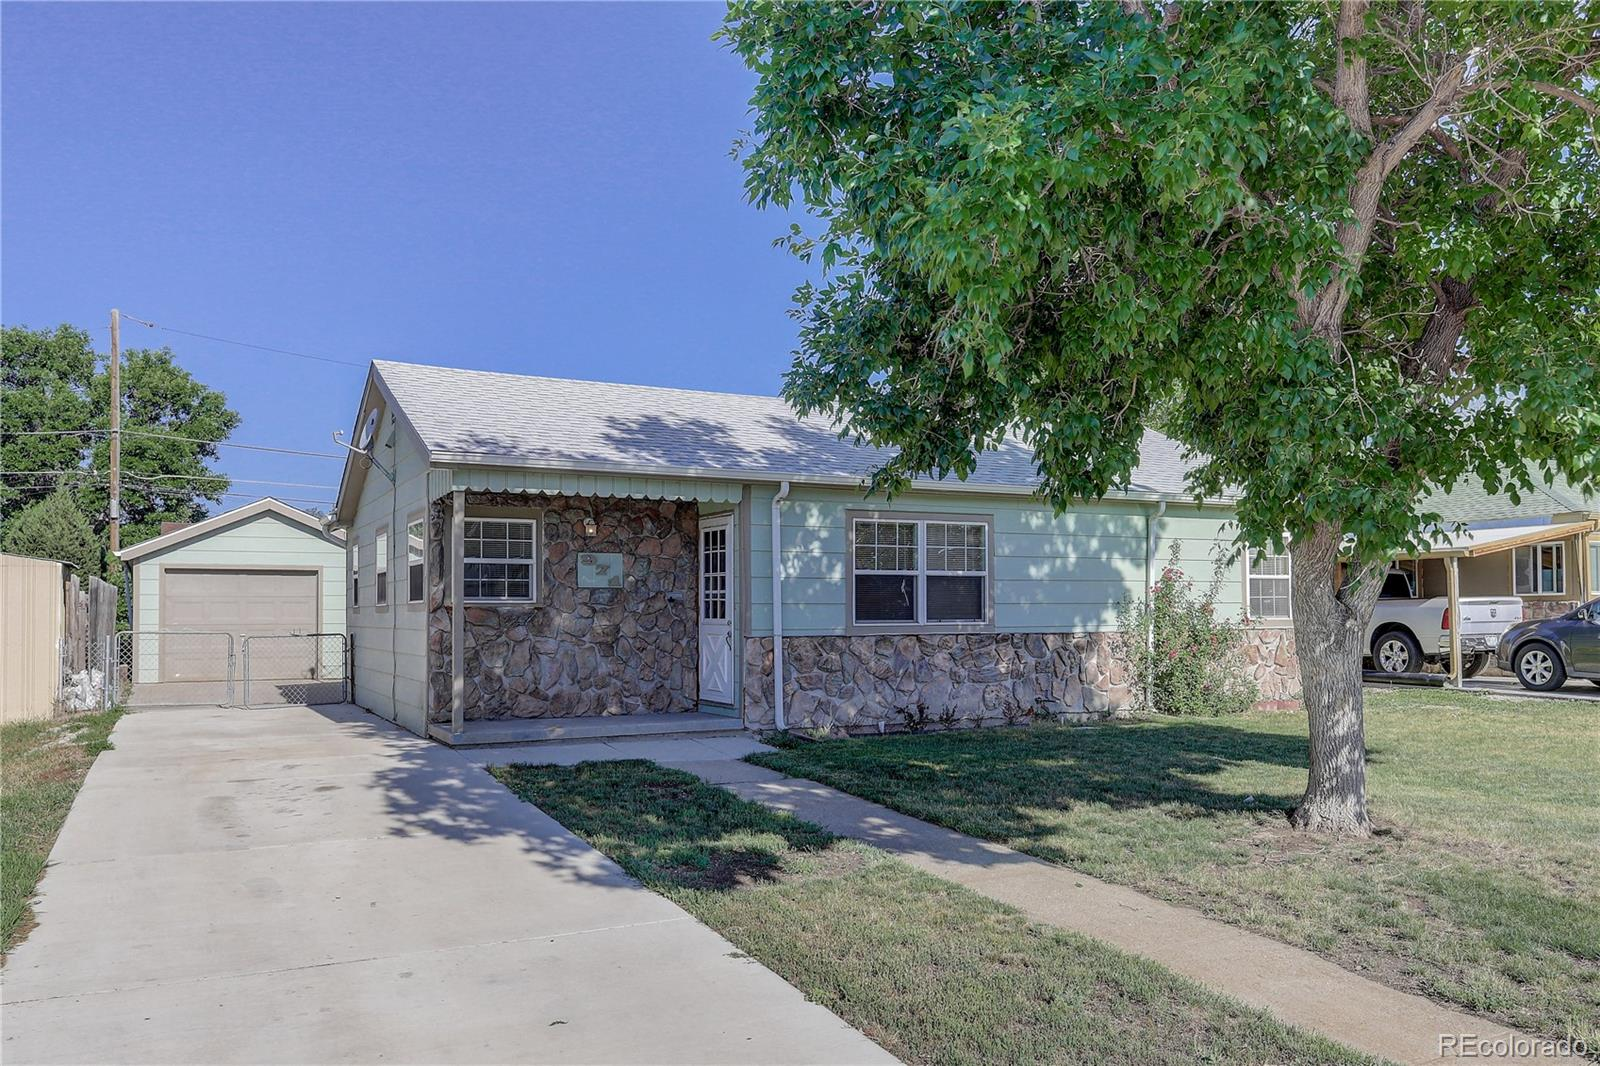 971 S Alcott Street Property Photo - Denver, CO real estate listing